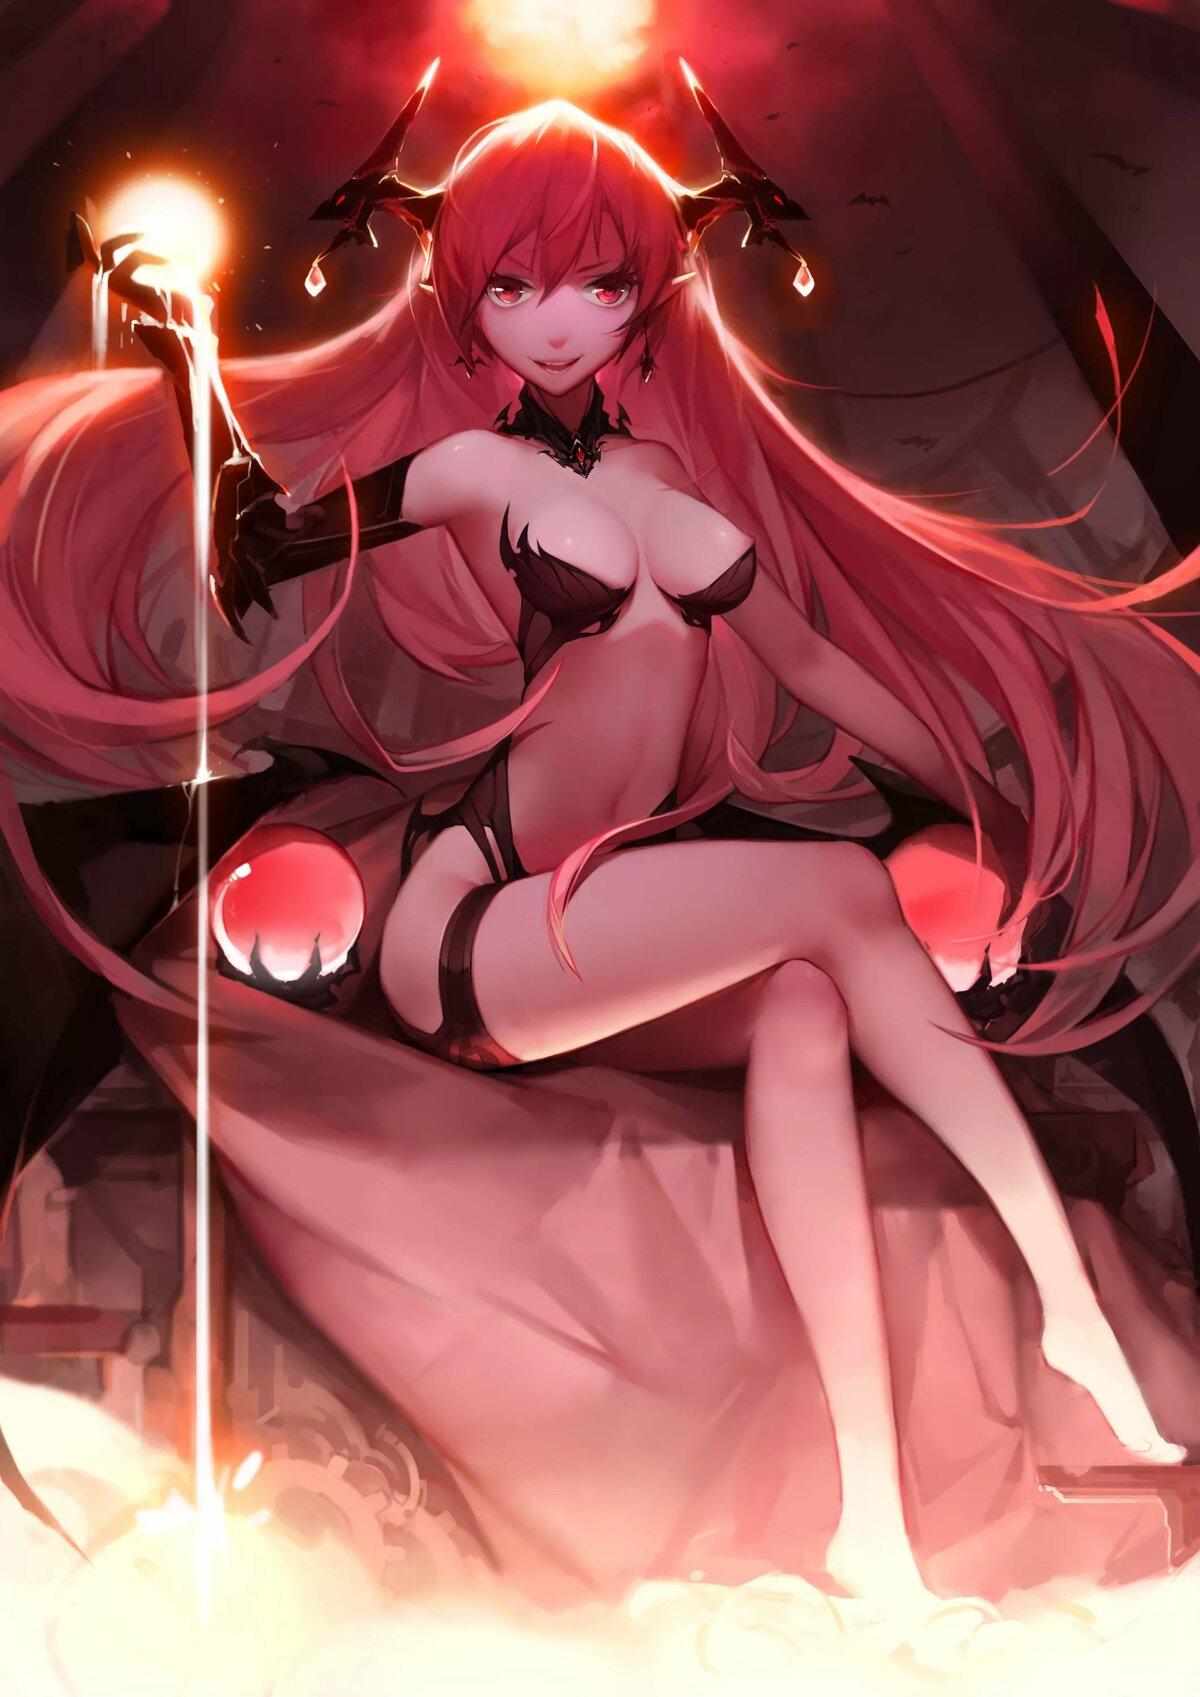 Демонесса аниме картинки